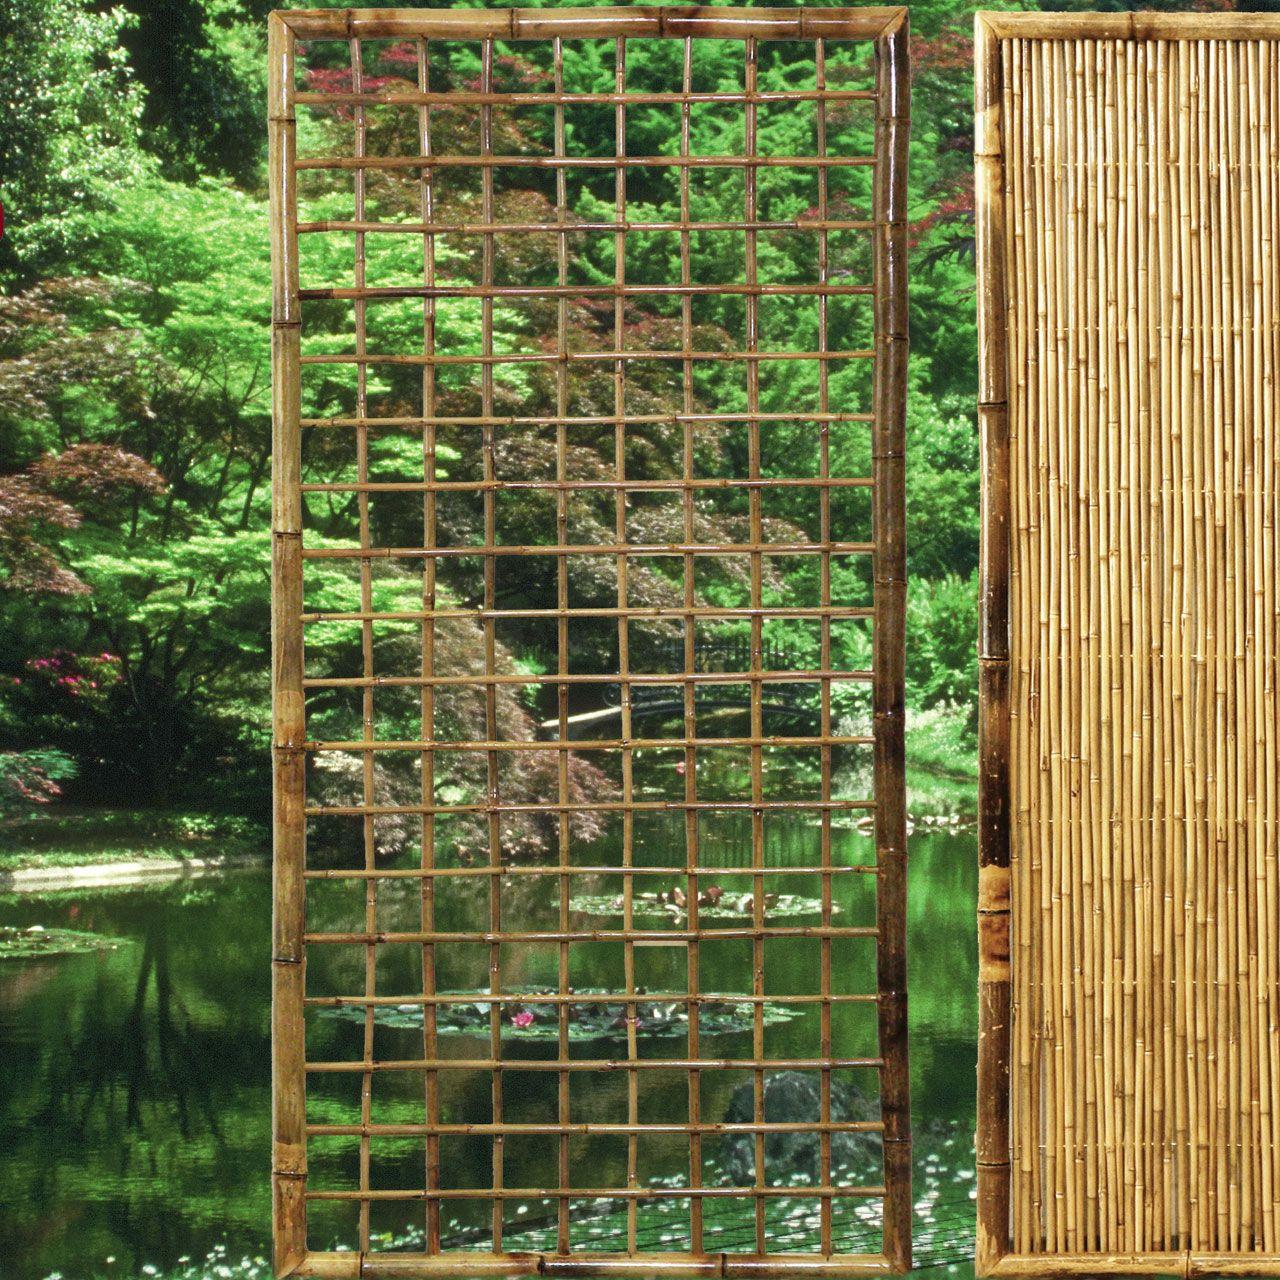 Holzkisten Bepflanzen Diy Rankgitter Dreierlei Liebelei Gartnern Auf Kleinem Raum Rankgitter Gitter Garten